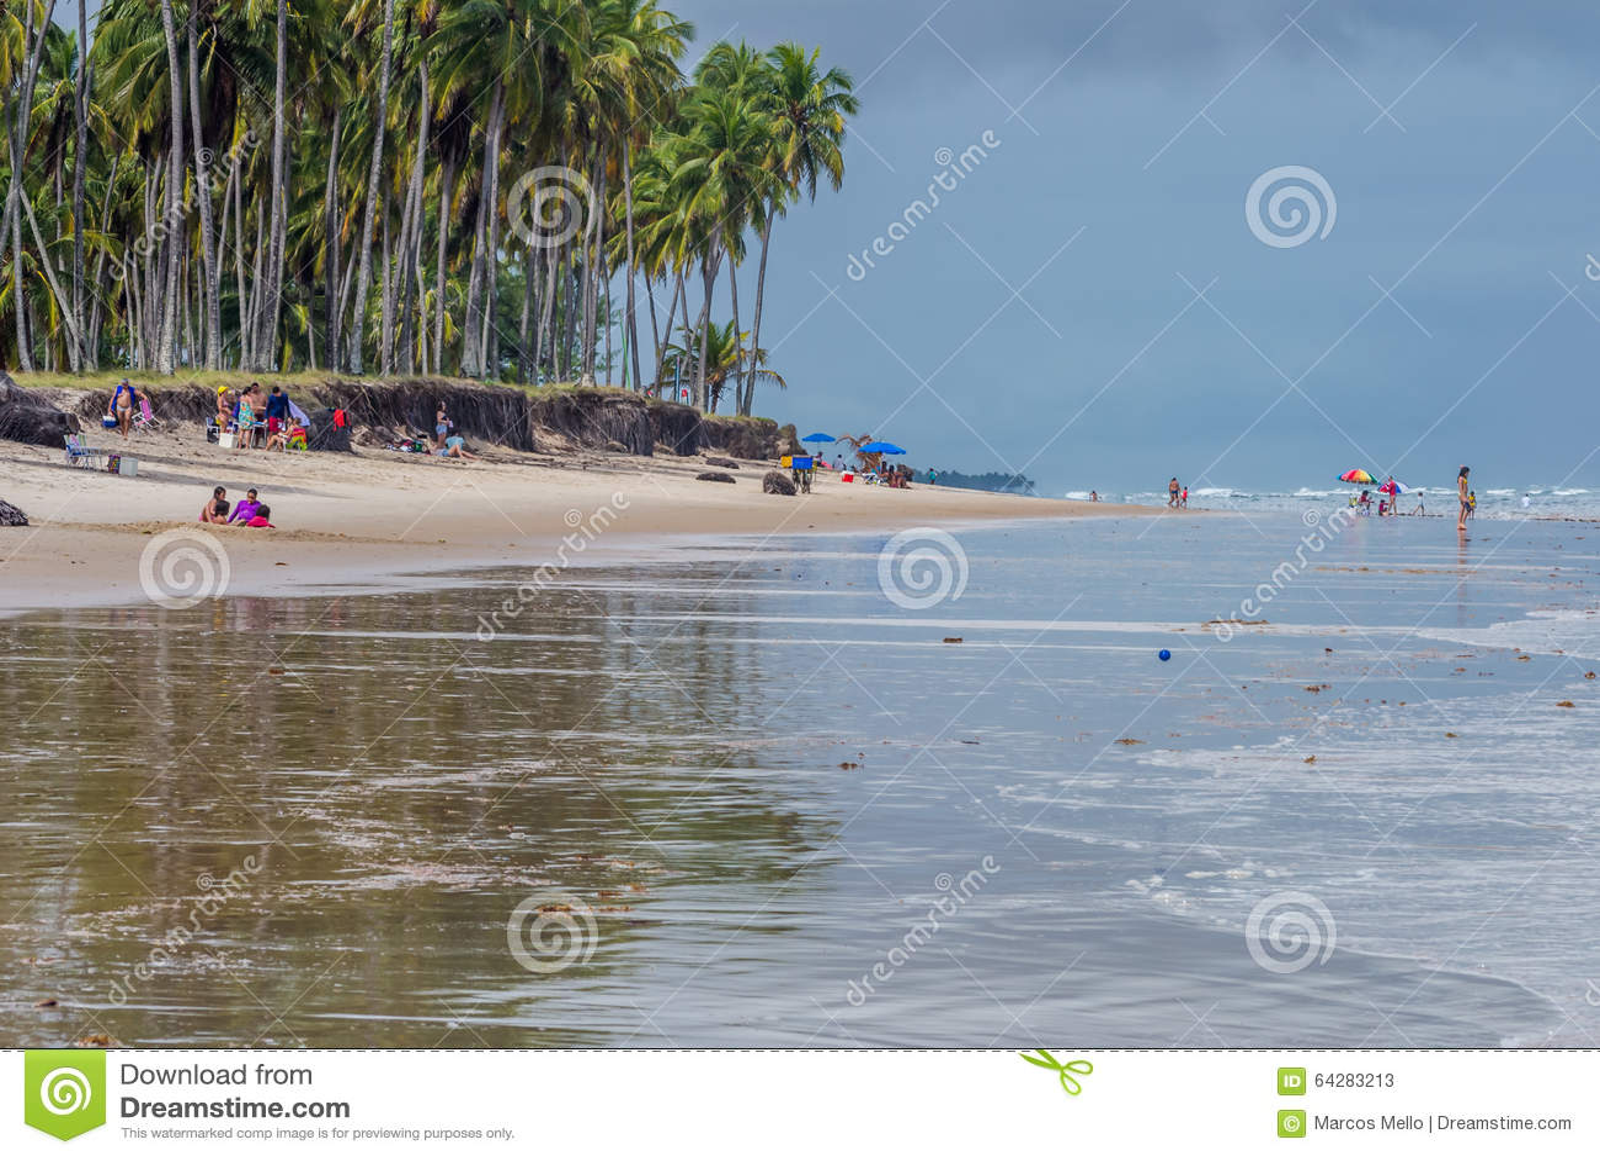 Praia robi Paiva Pernambuco, Brazylia, -